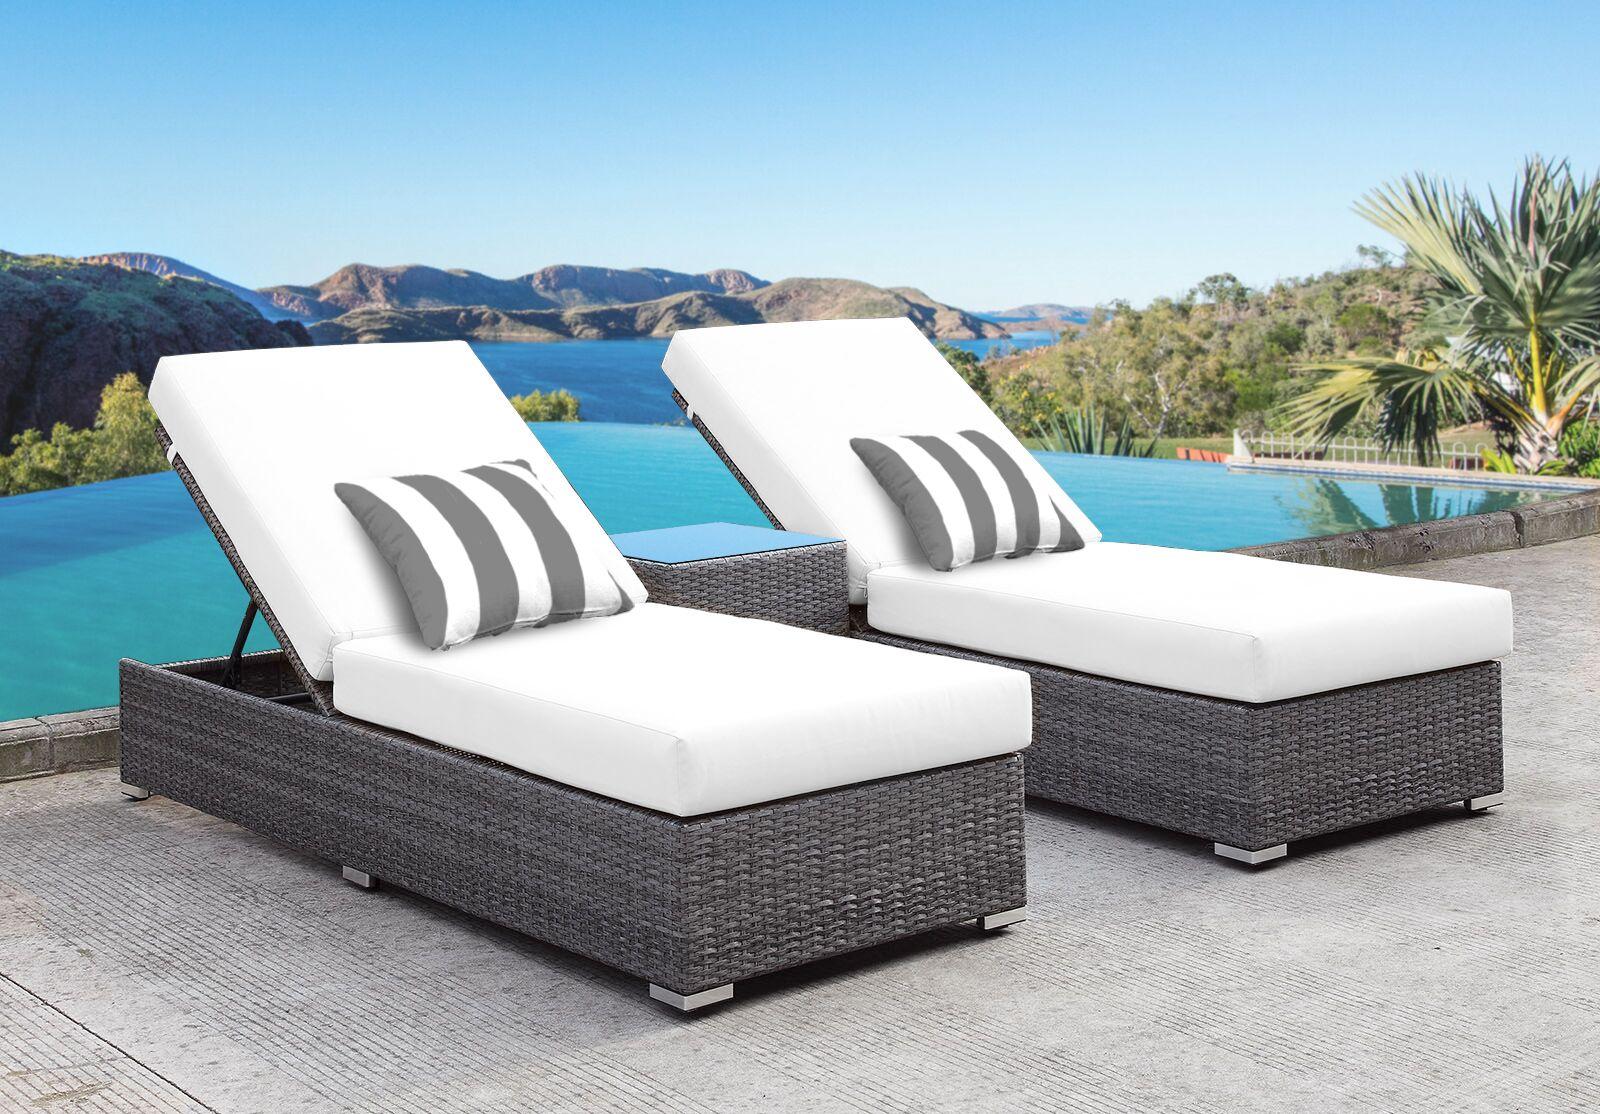 Zavis 3 Piece Reclining Chaise Lounge Set Cushion Color: White/Gray